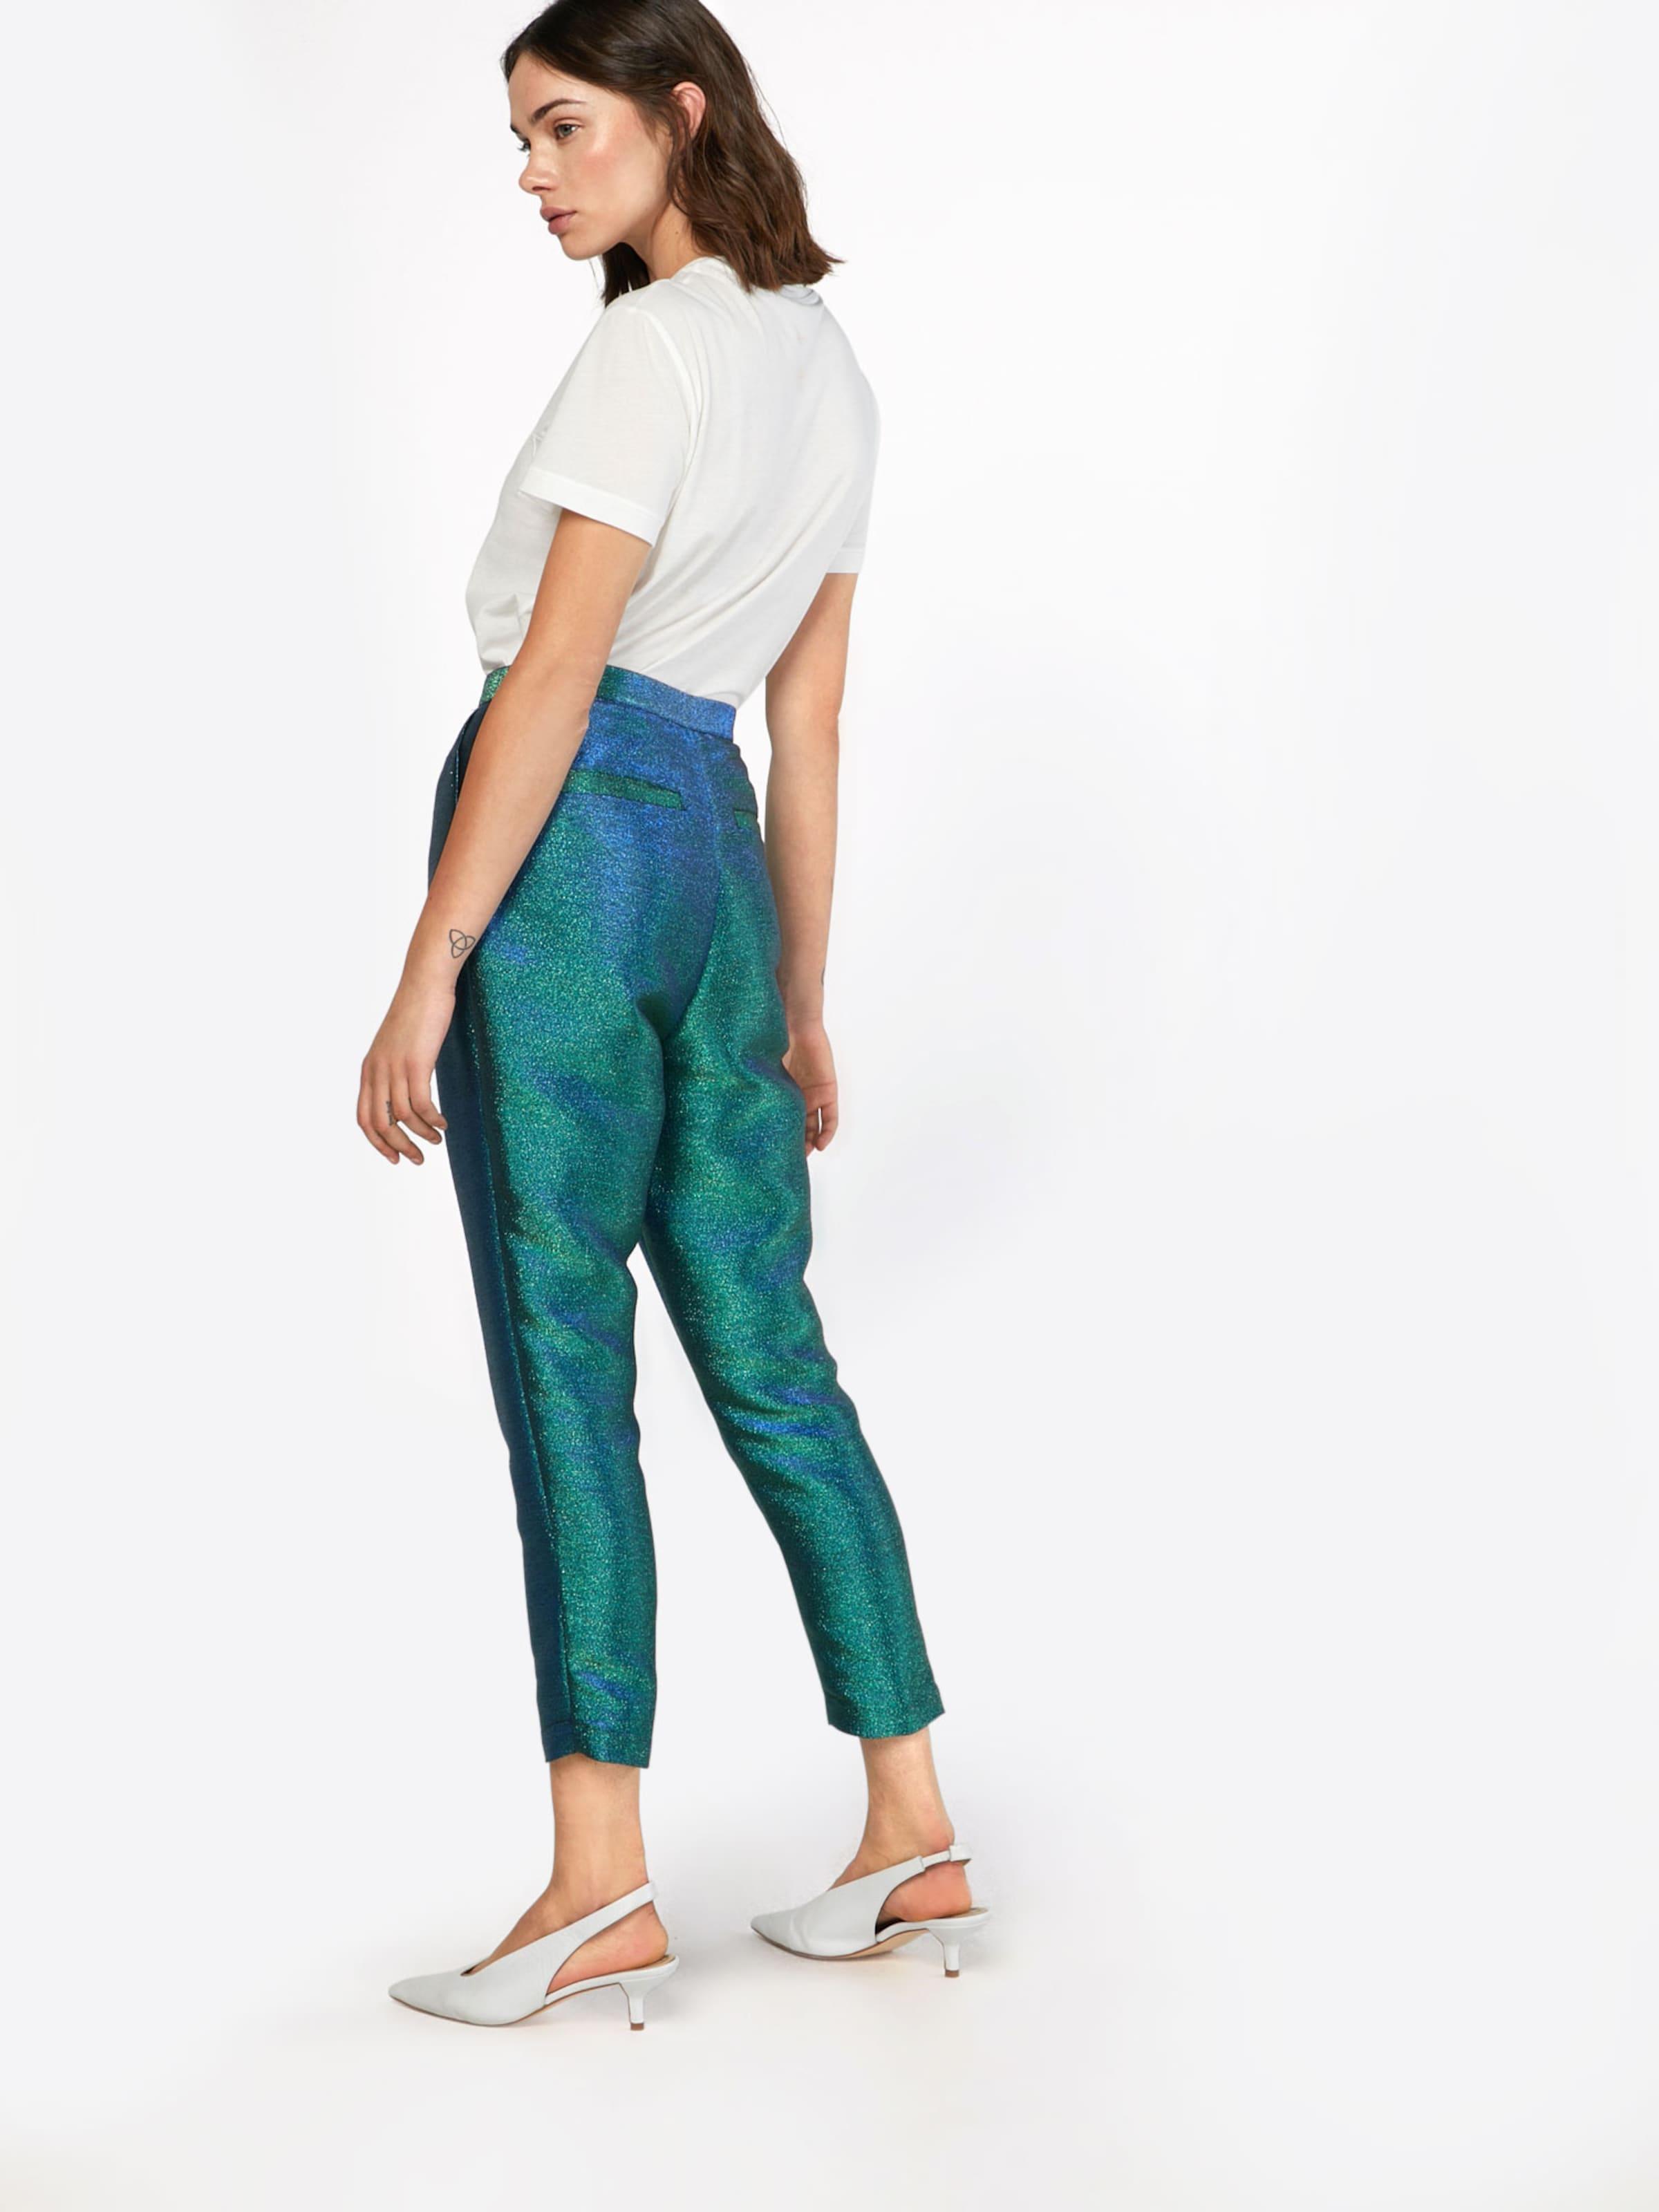 Postyr Postyr 'poshosta' En Vert Postyr Pantalon Pantalon 'poshosta' Vert En qMSUVzp